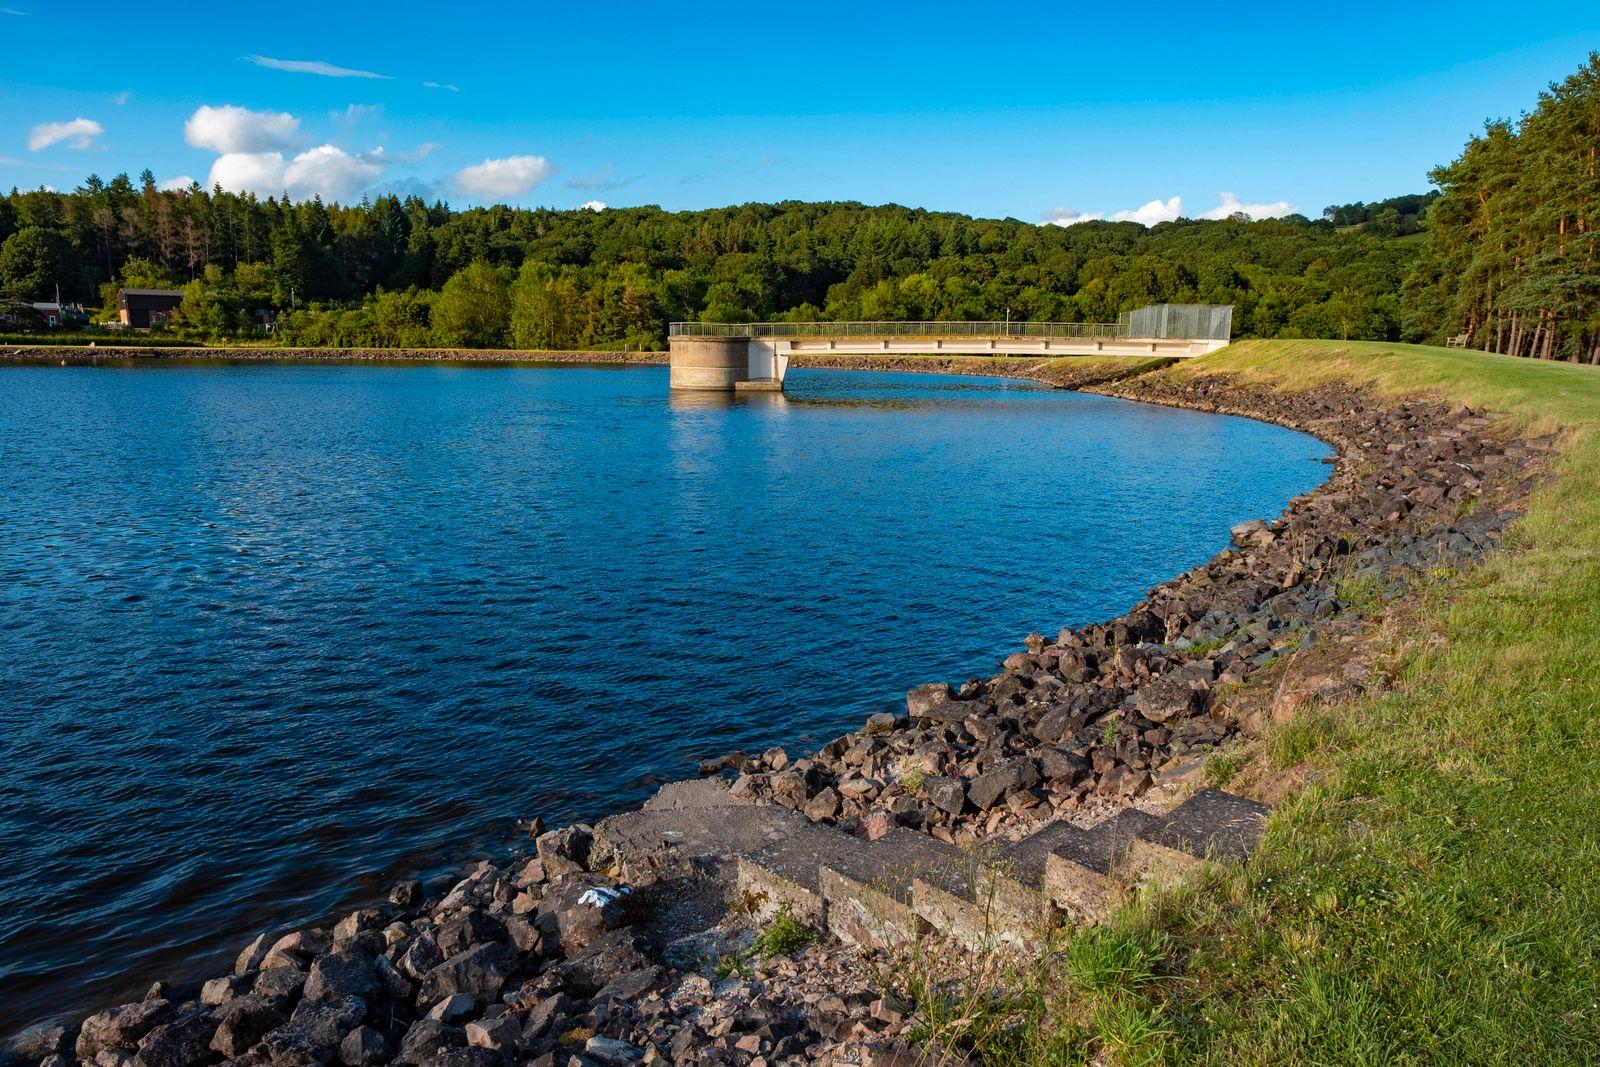 Trimpley Reservoir near Kidderminster in Worcestershire. PUBLICATIONxINxGERxSUIxAUTxONLY Copyright: xDominicxJones/LOOPx